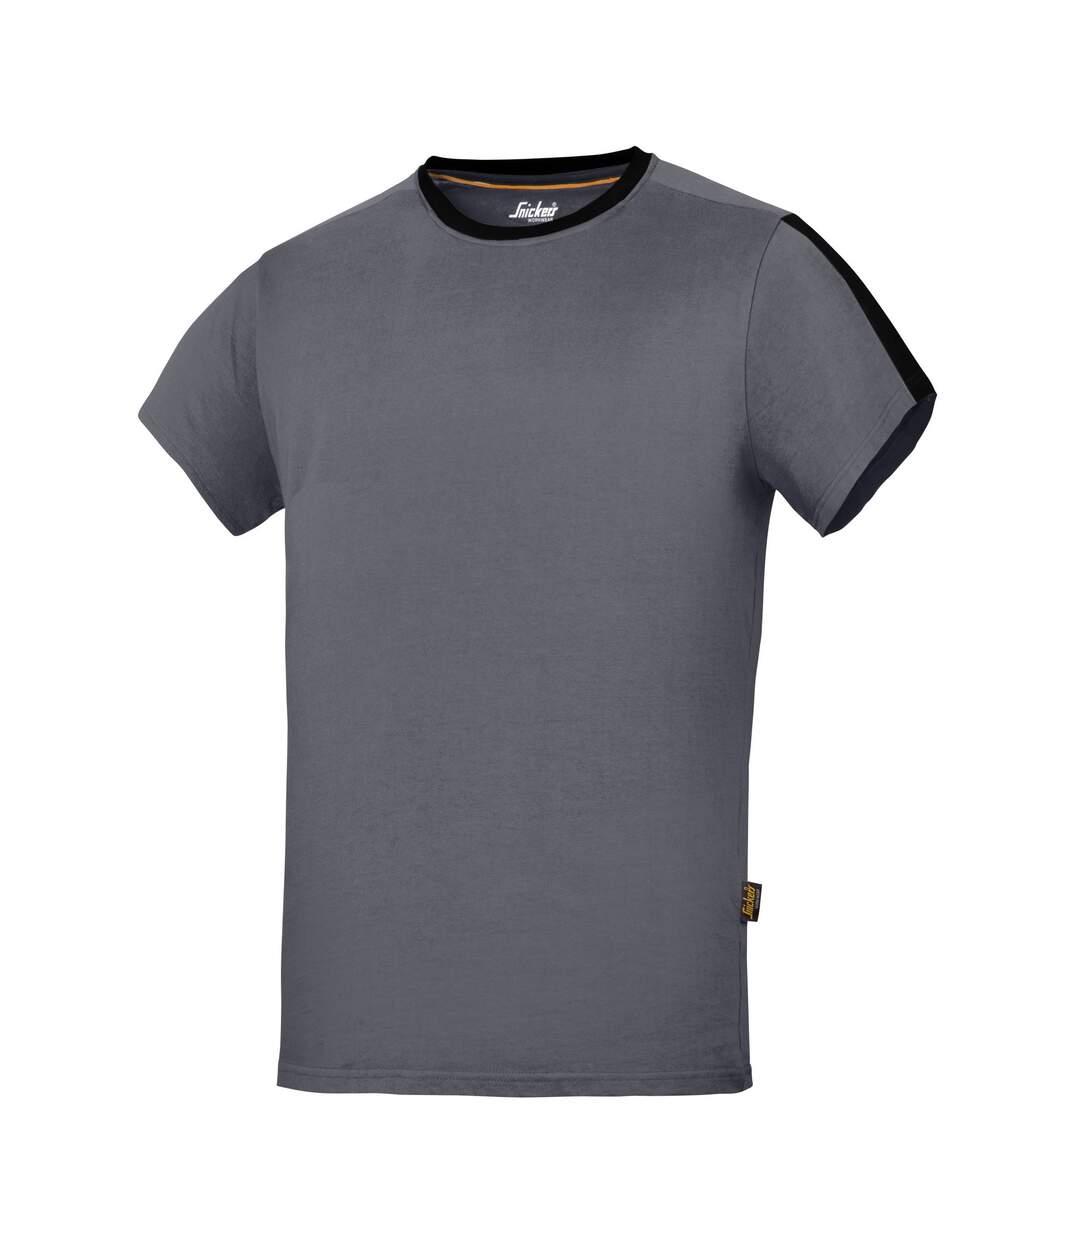 Snickers Mens AllroundWork Short Sleeve T-Shirt (Steel Grey/Black) - UTRW5482